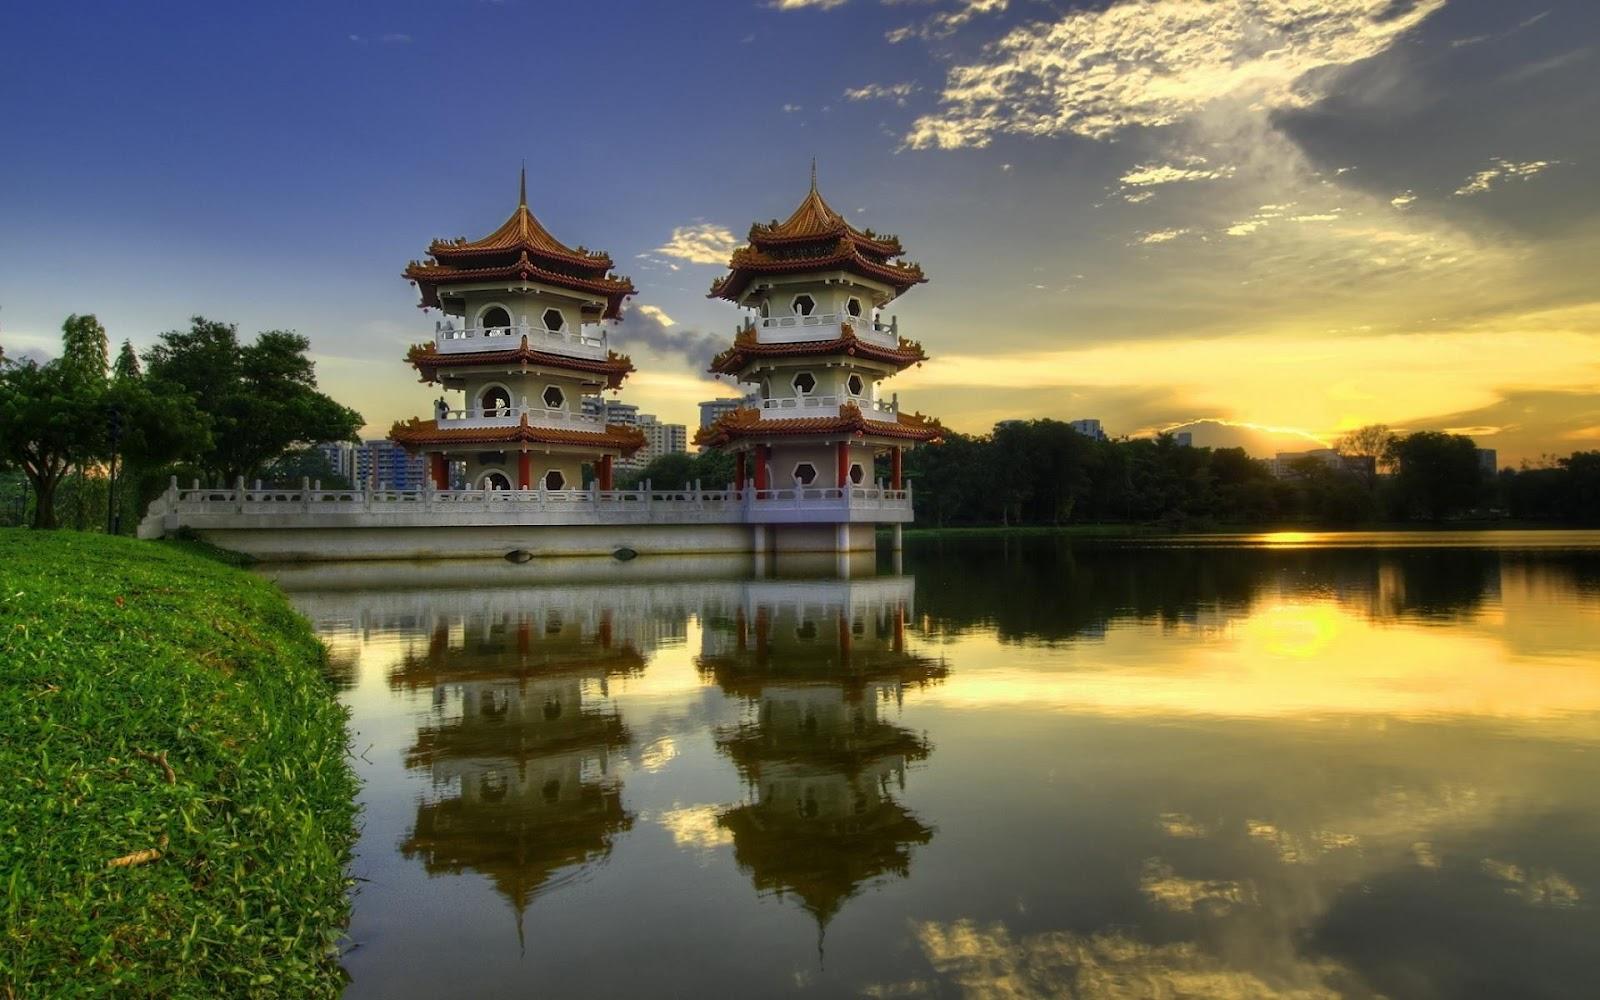 http://3.bp.blogspot.com/-U64RxVdZk9A/UEshNkFGv3I/AAAAAAAAFAc/Tdw1-l_nPr8/s1600/Chinese-pagoda-1200.jpg